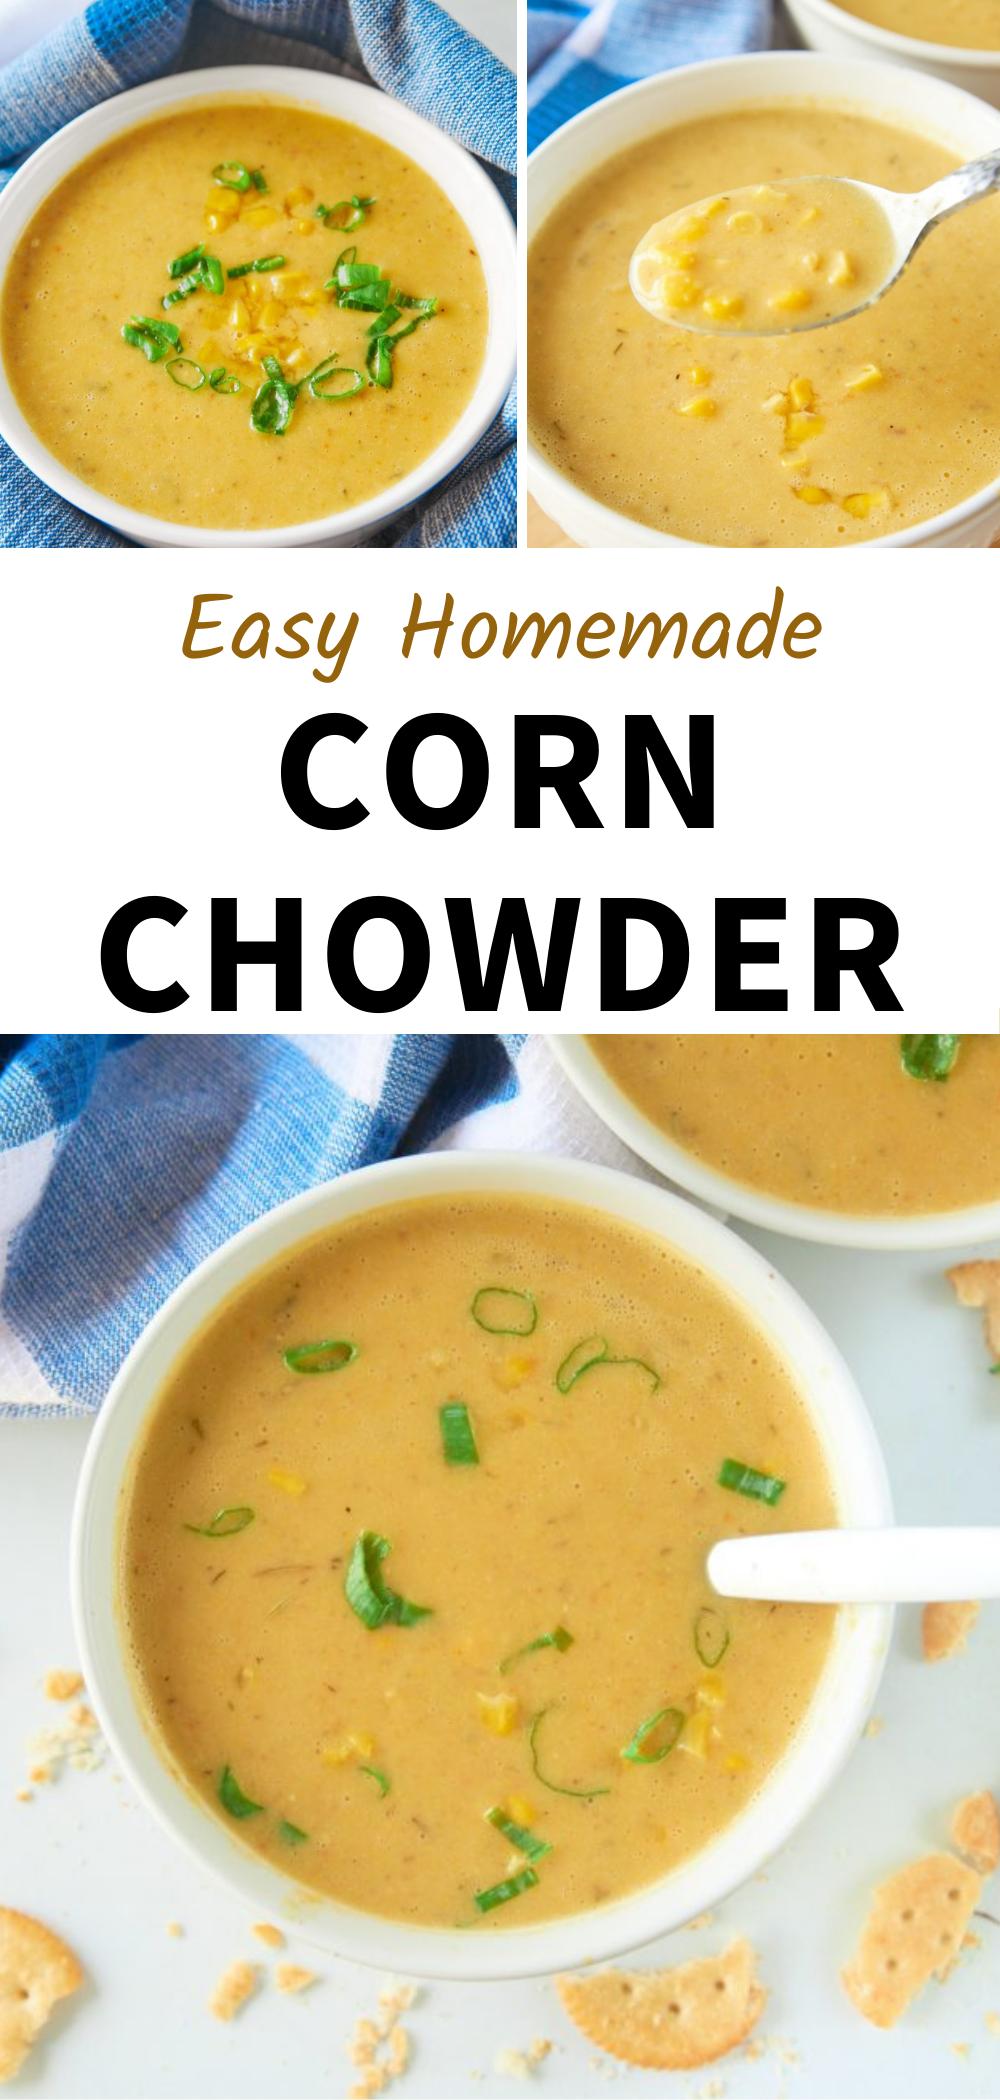 Easy Vegan Corn Chowder Wow It S Veggie Recipe In 2020 Winter Soup Recipe Chowder Recipes Easy Vegan Soup